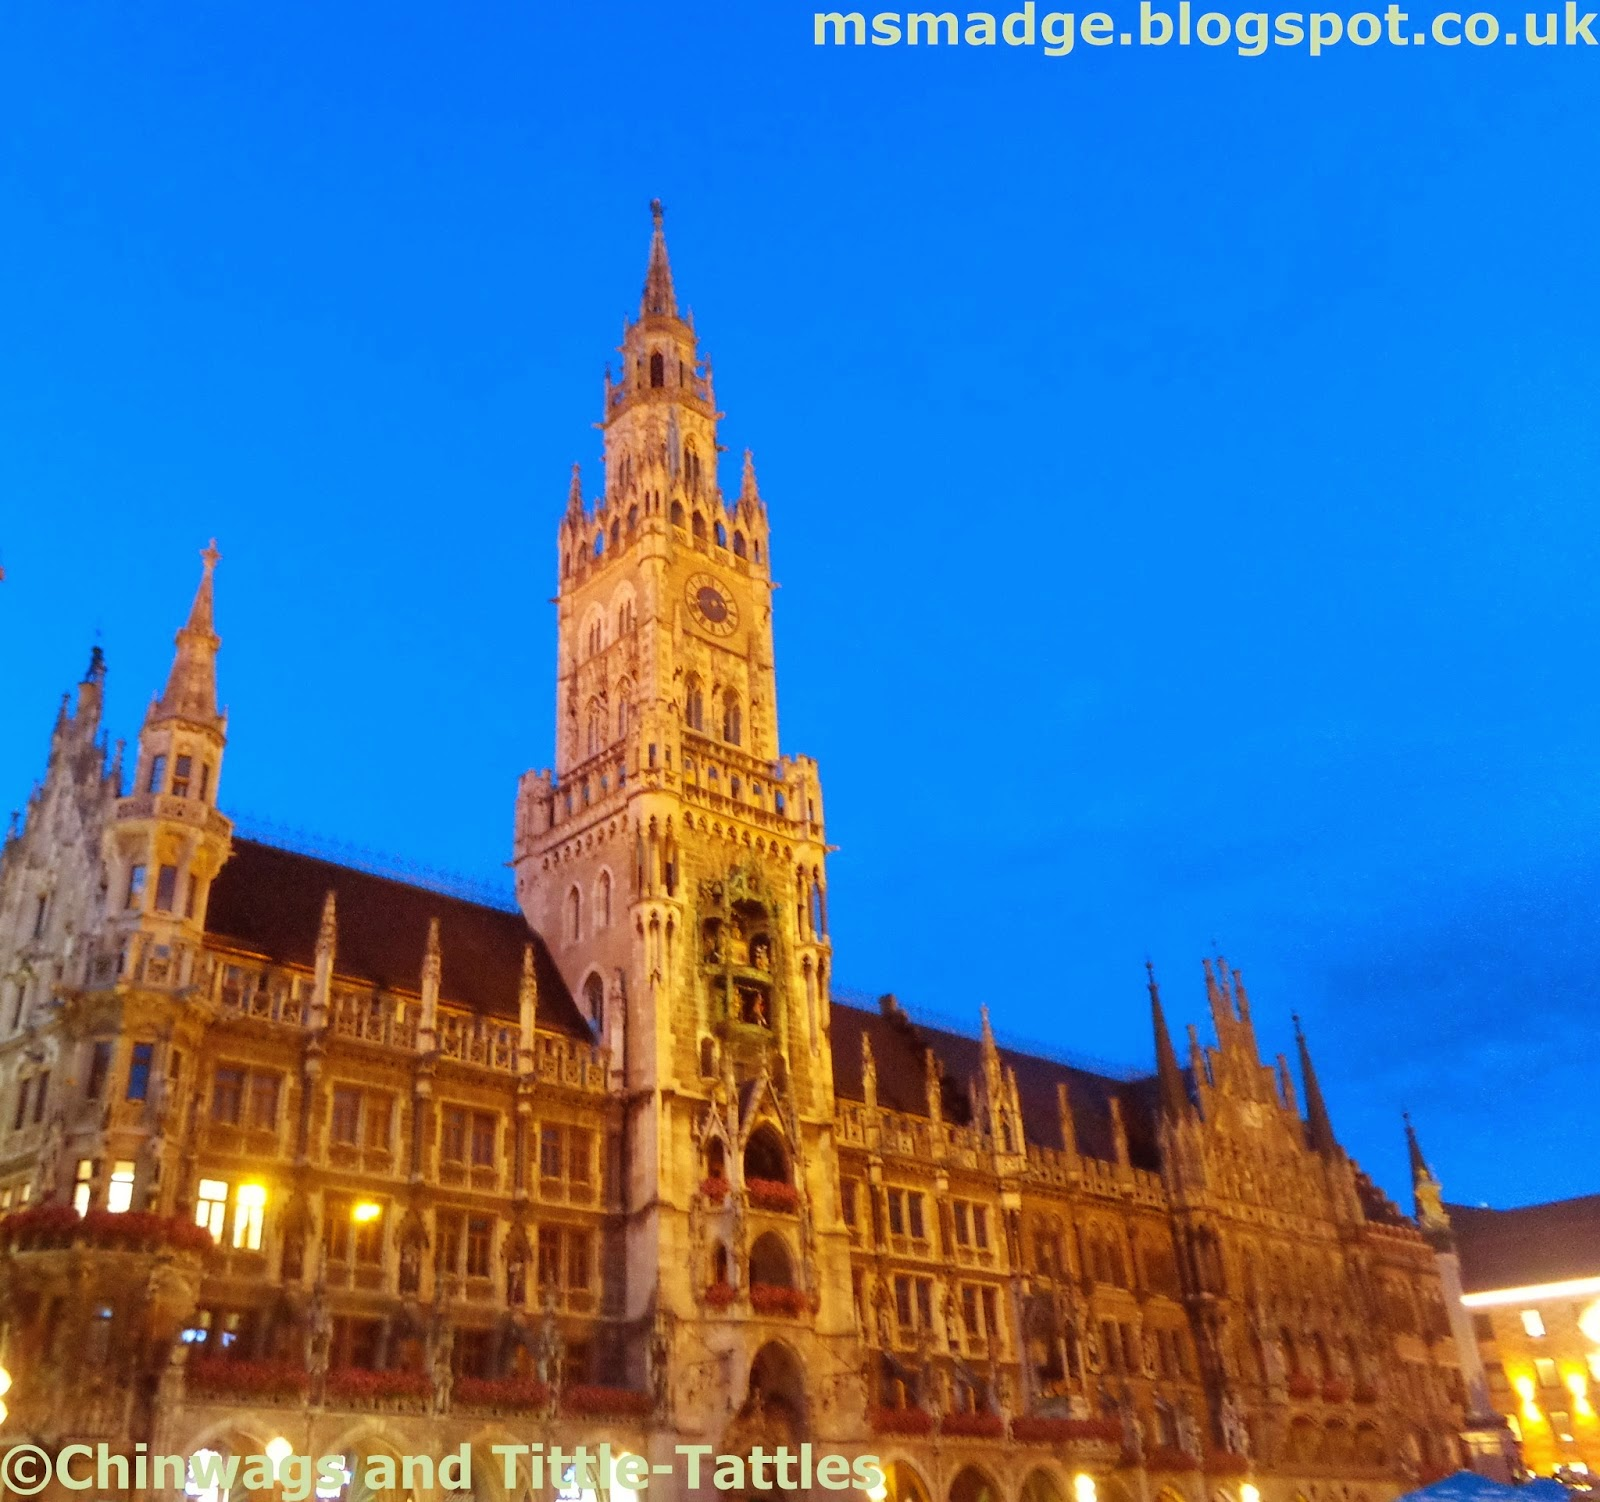 http://msmadge.blogspot.co.uk/2014/09/a-taste-of-bavaria.html